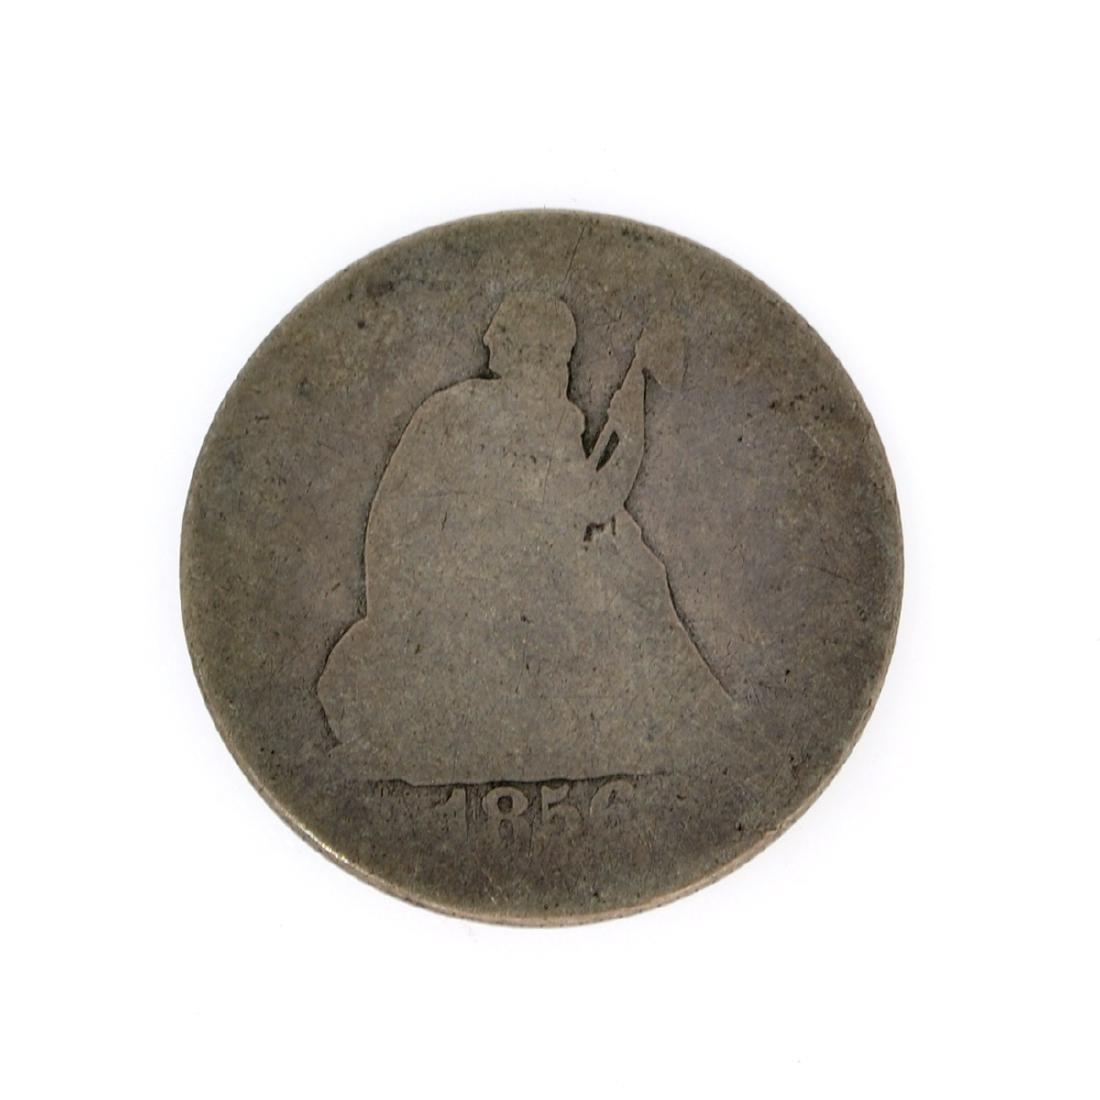 Rare 1856 Liberty Seated Quarter Dollar Coin